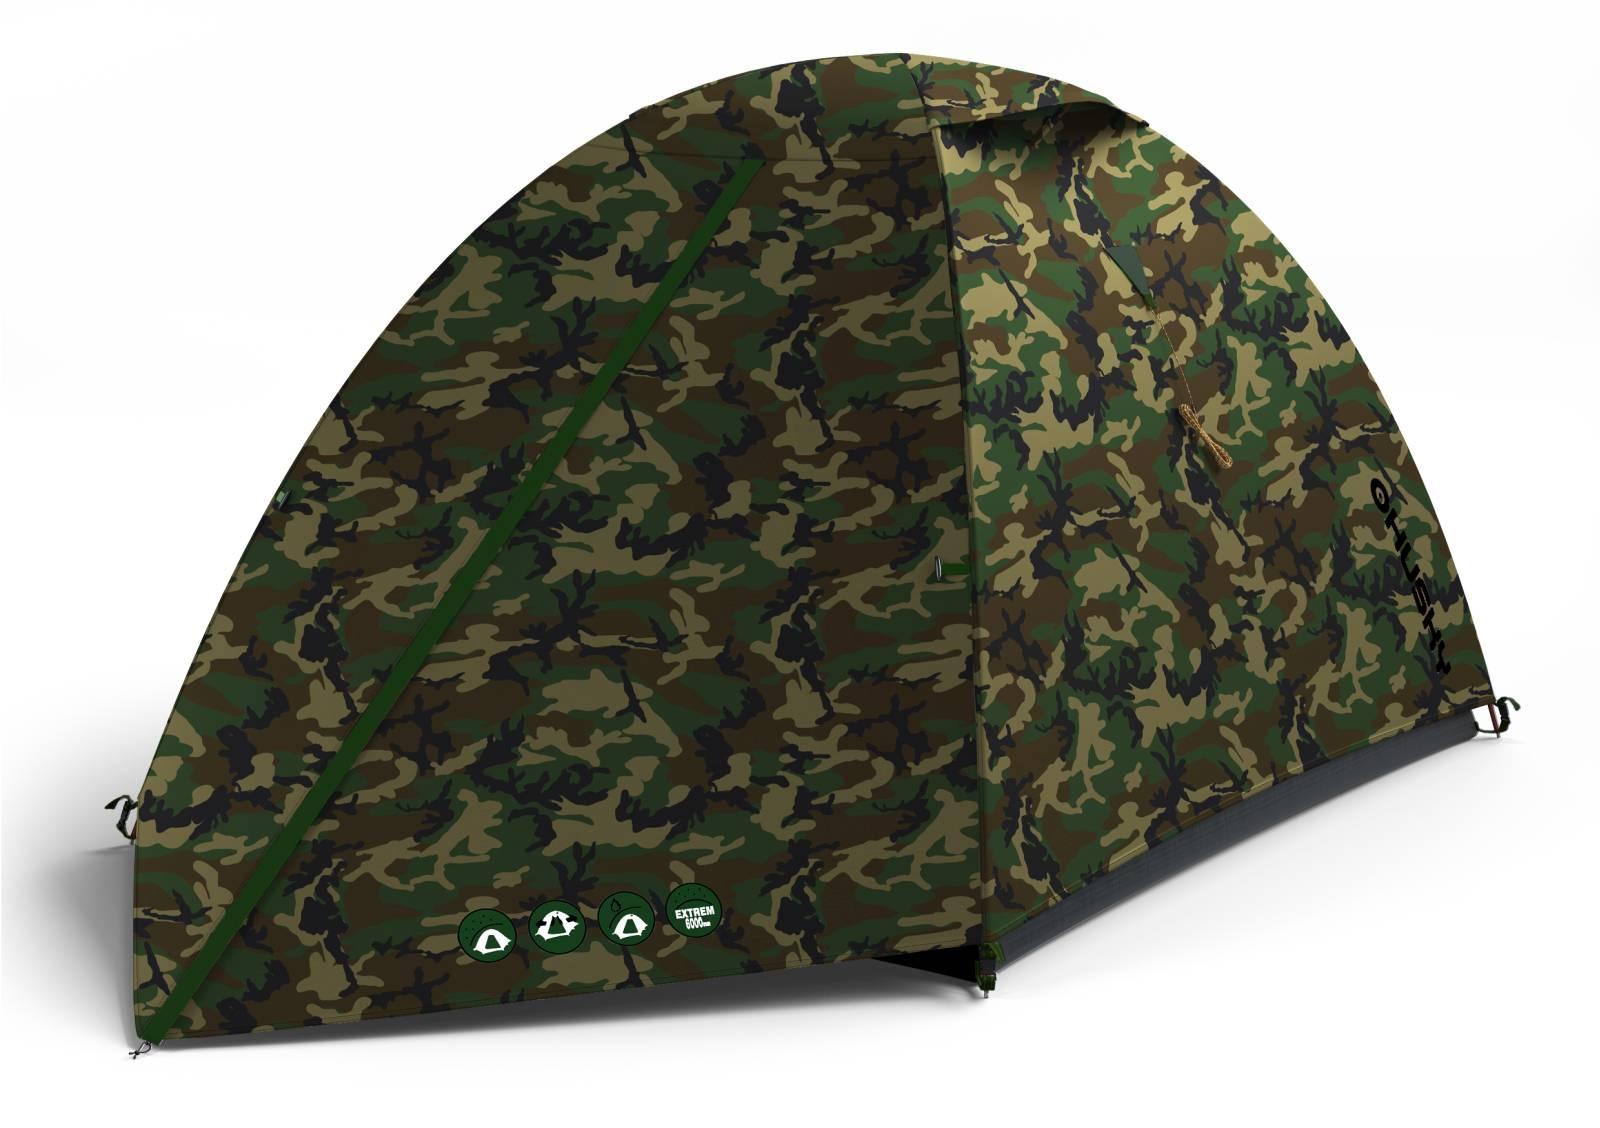 Stan Outdoor Bizam 2 army zelená